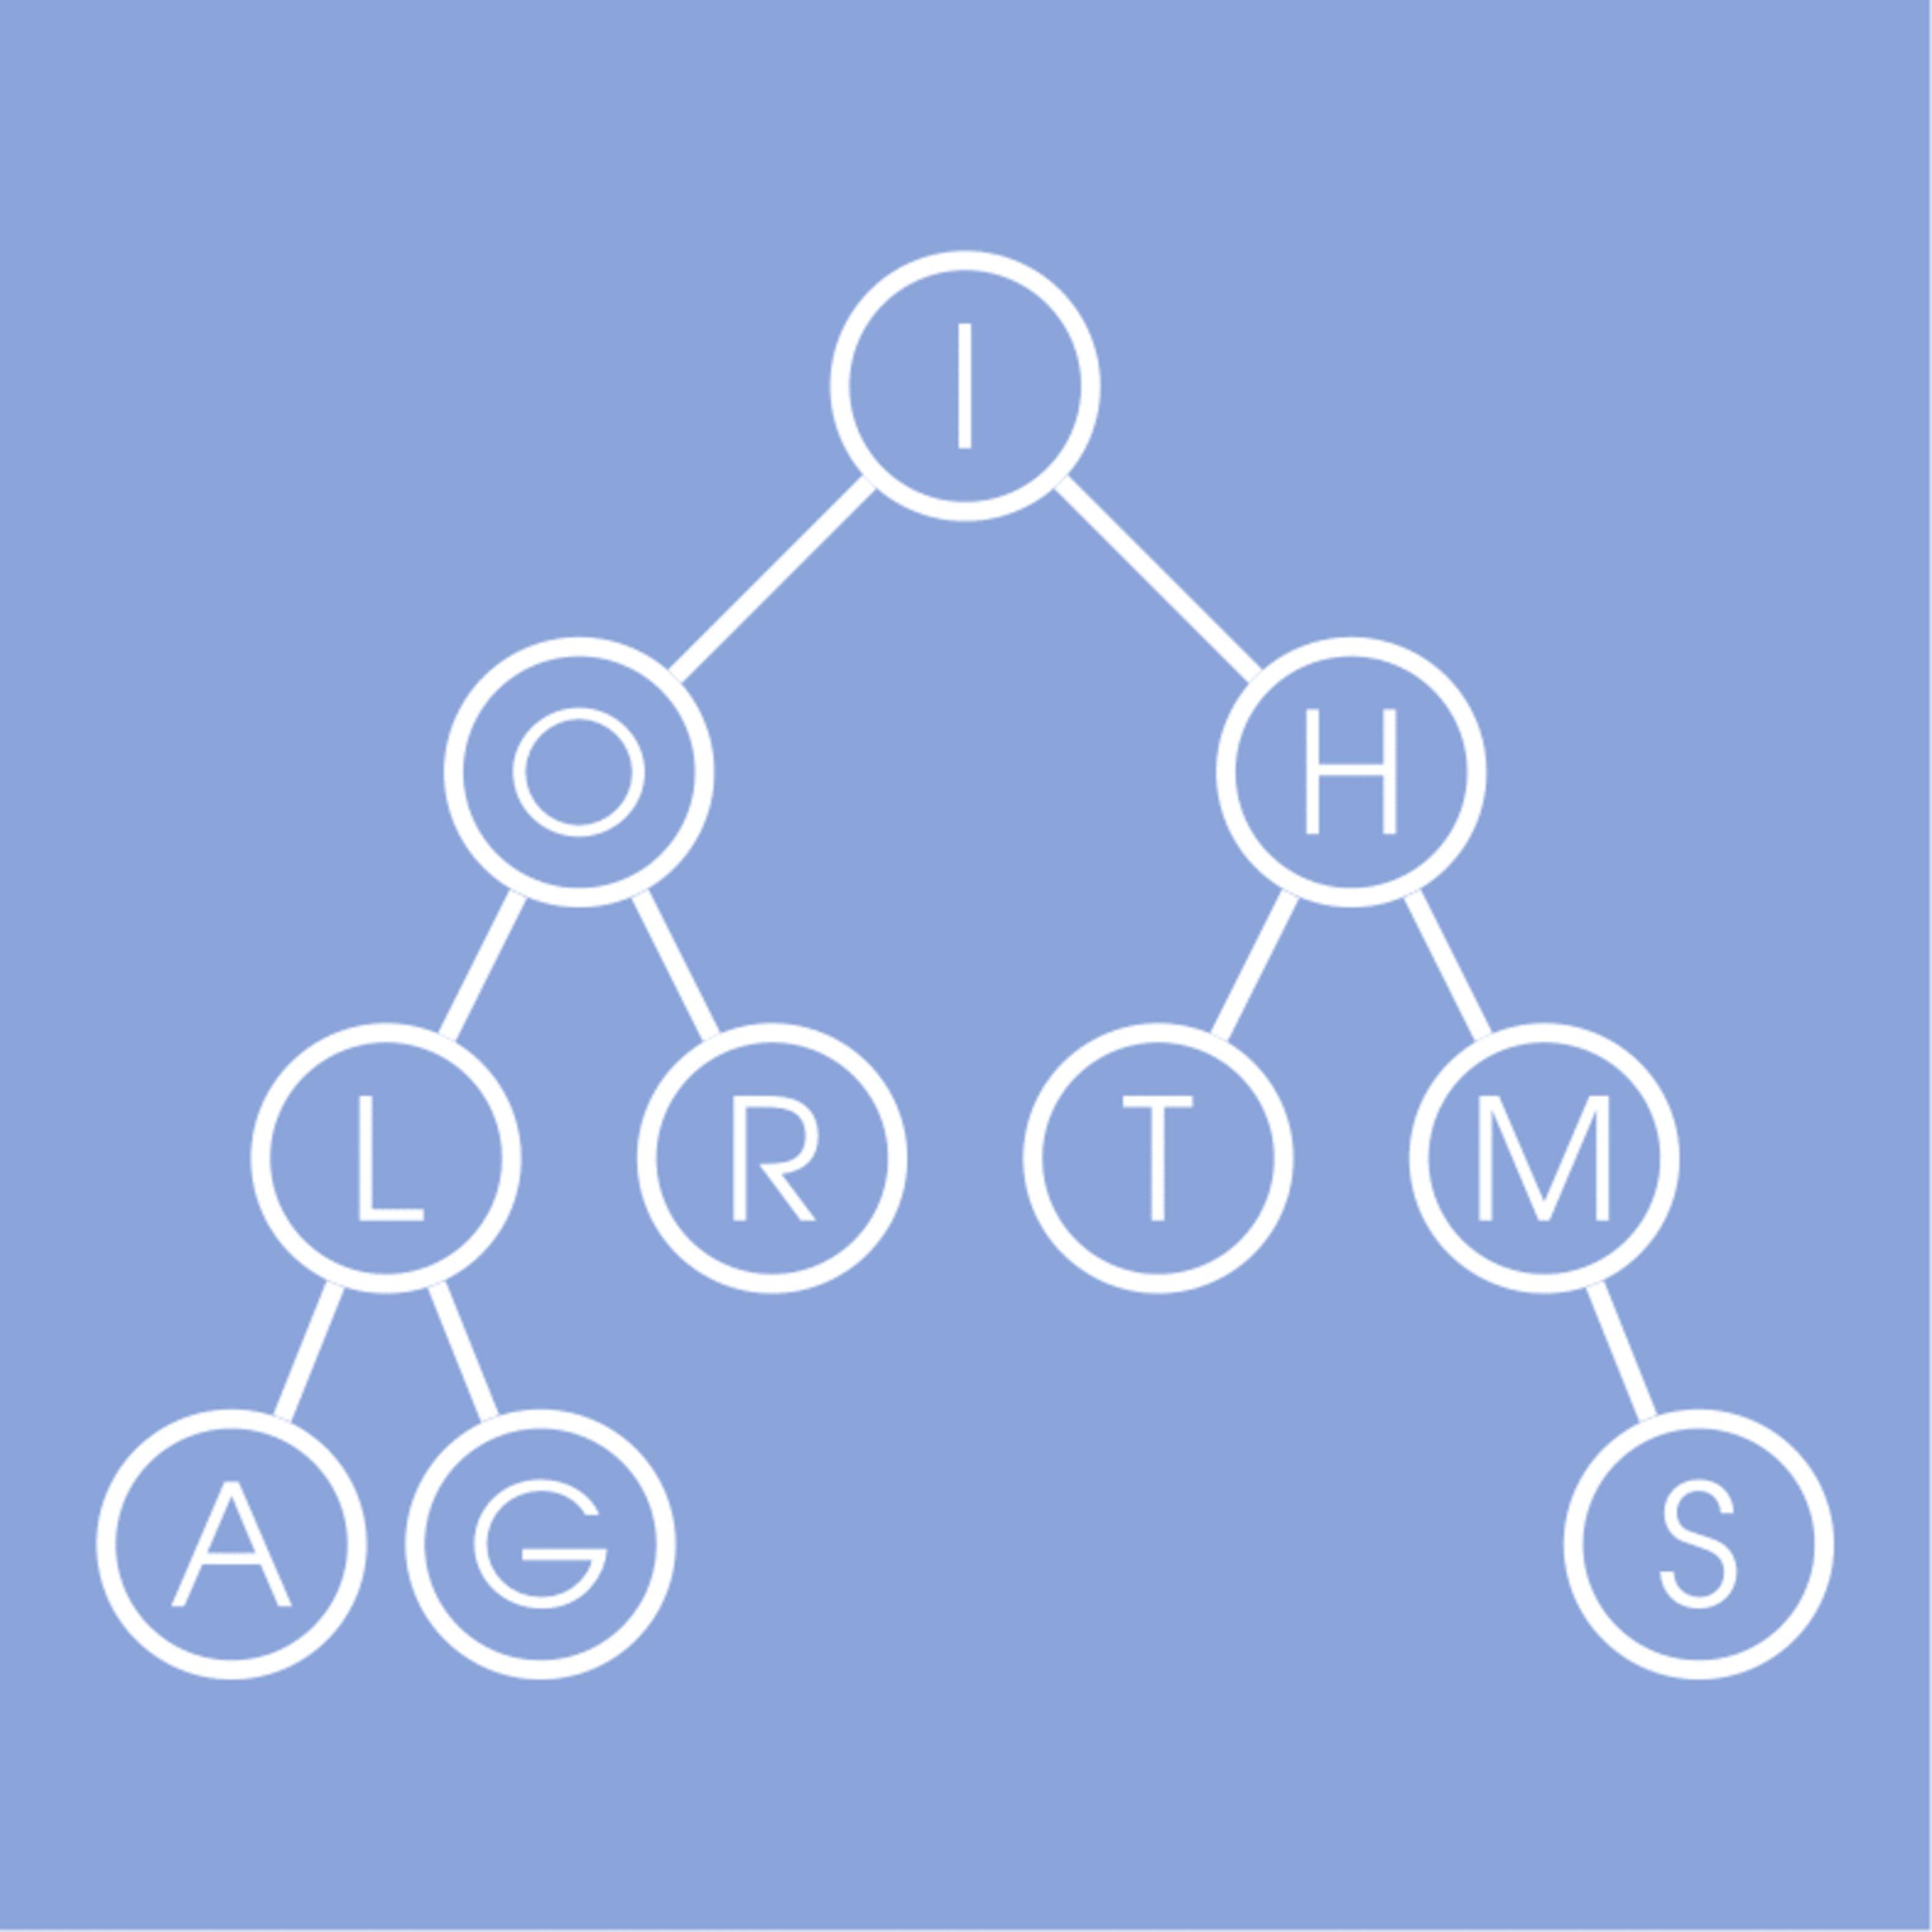 Coursera - Data Structures (University of California San Diego)